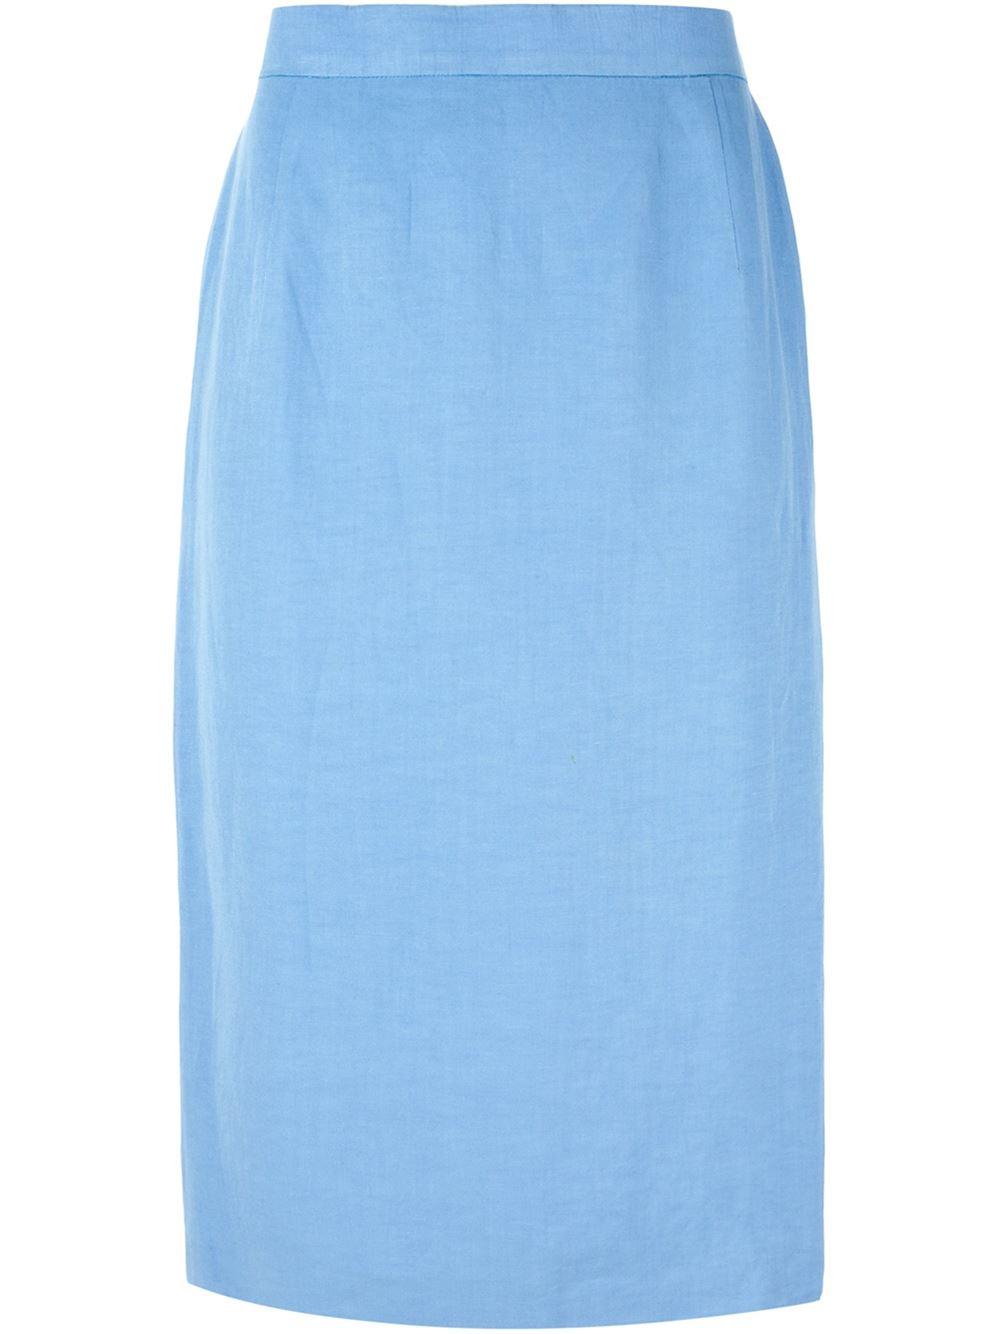 louis feraud vintage classic pencil skirt in blue lyst